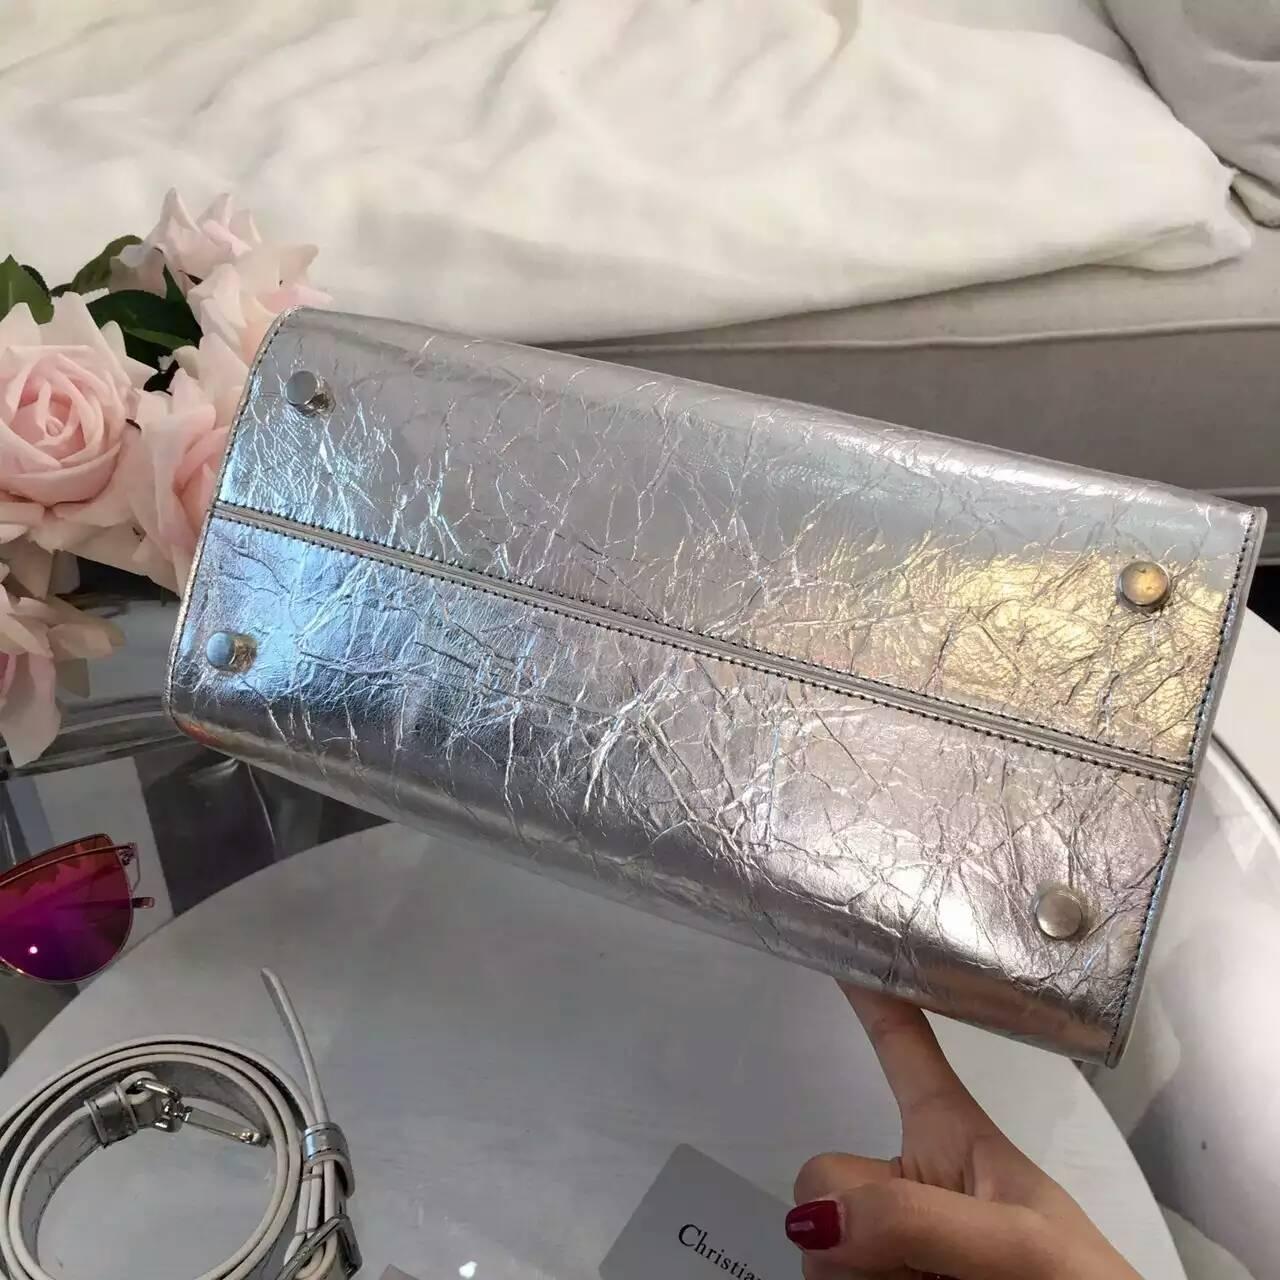 Christian Dior迪奥新款包包 Diorever银白色手提斜挎女包